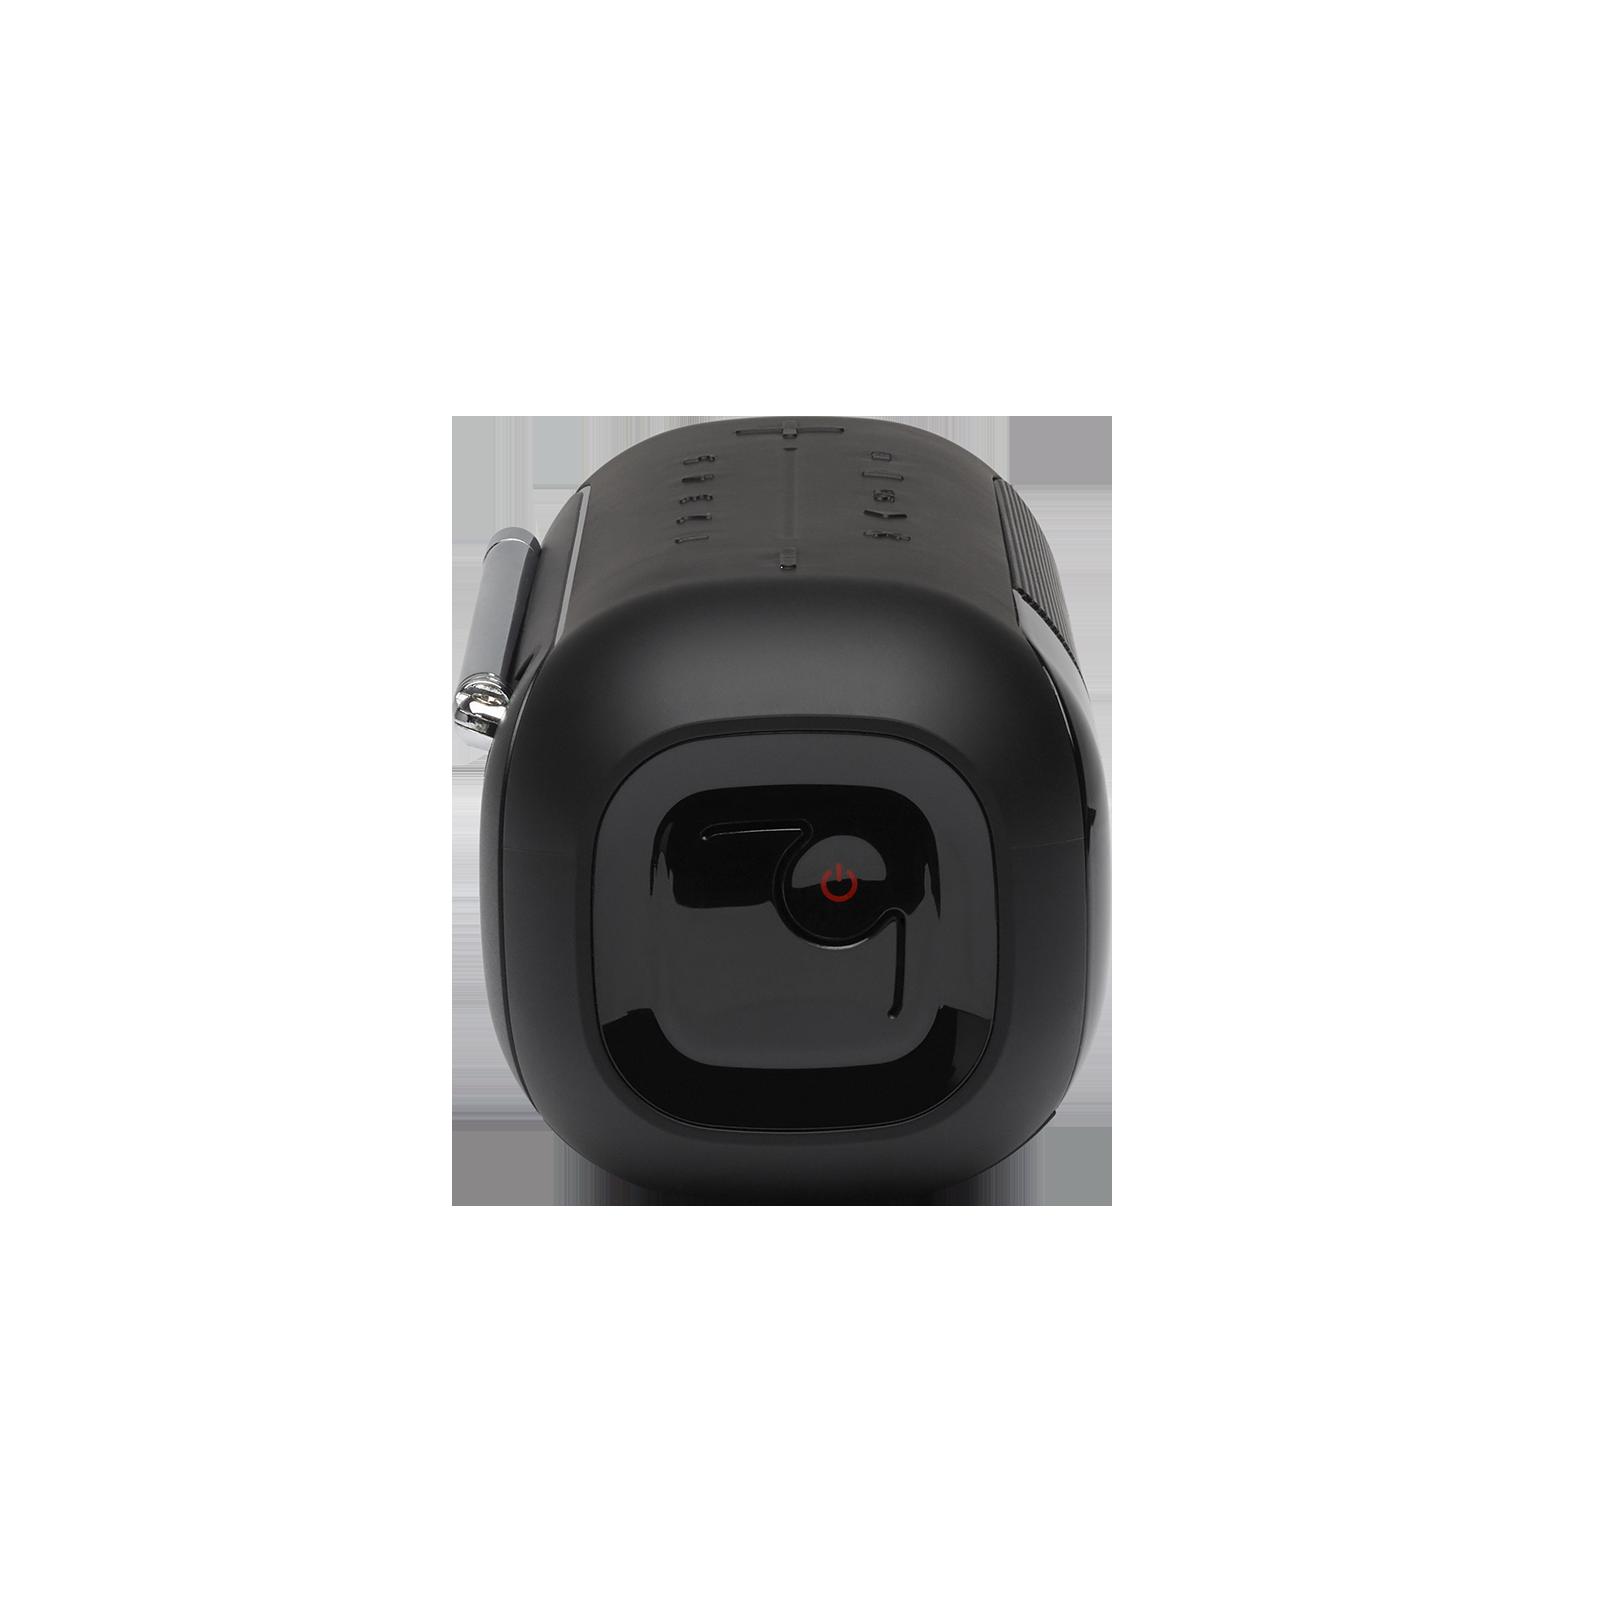 JBL Tuner 2 FM - Black - Portable FM radio with Bluetooth - Detailshot 1